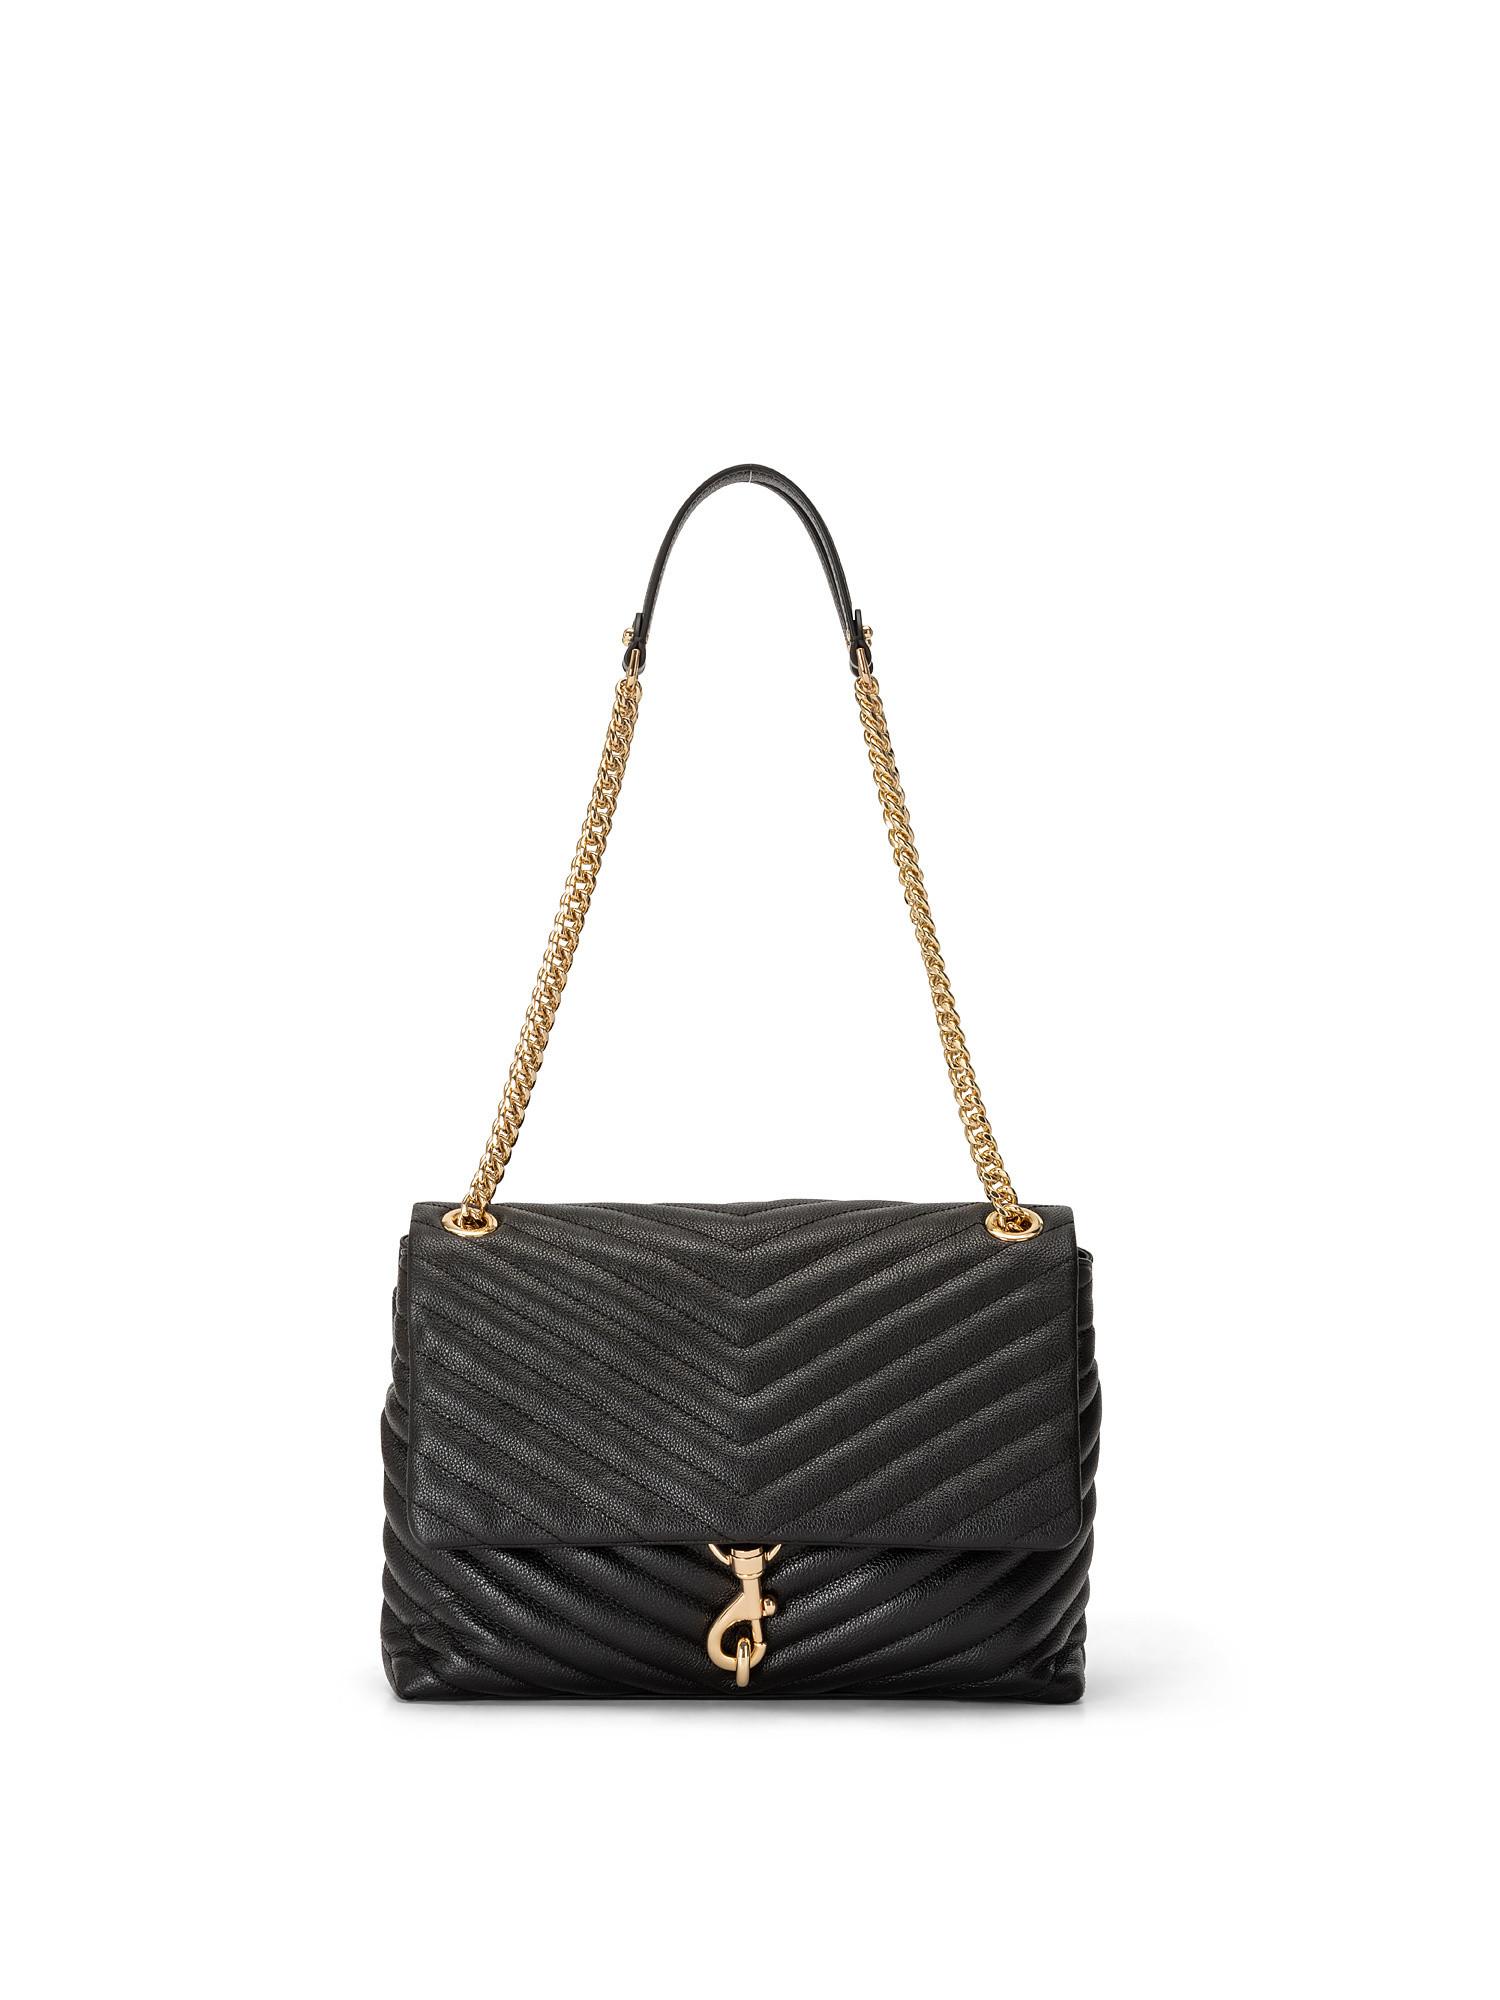 Edie Flap Shoulder Bag, Nero, large image number 0